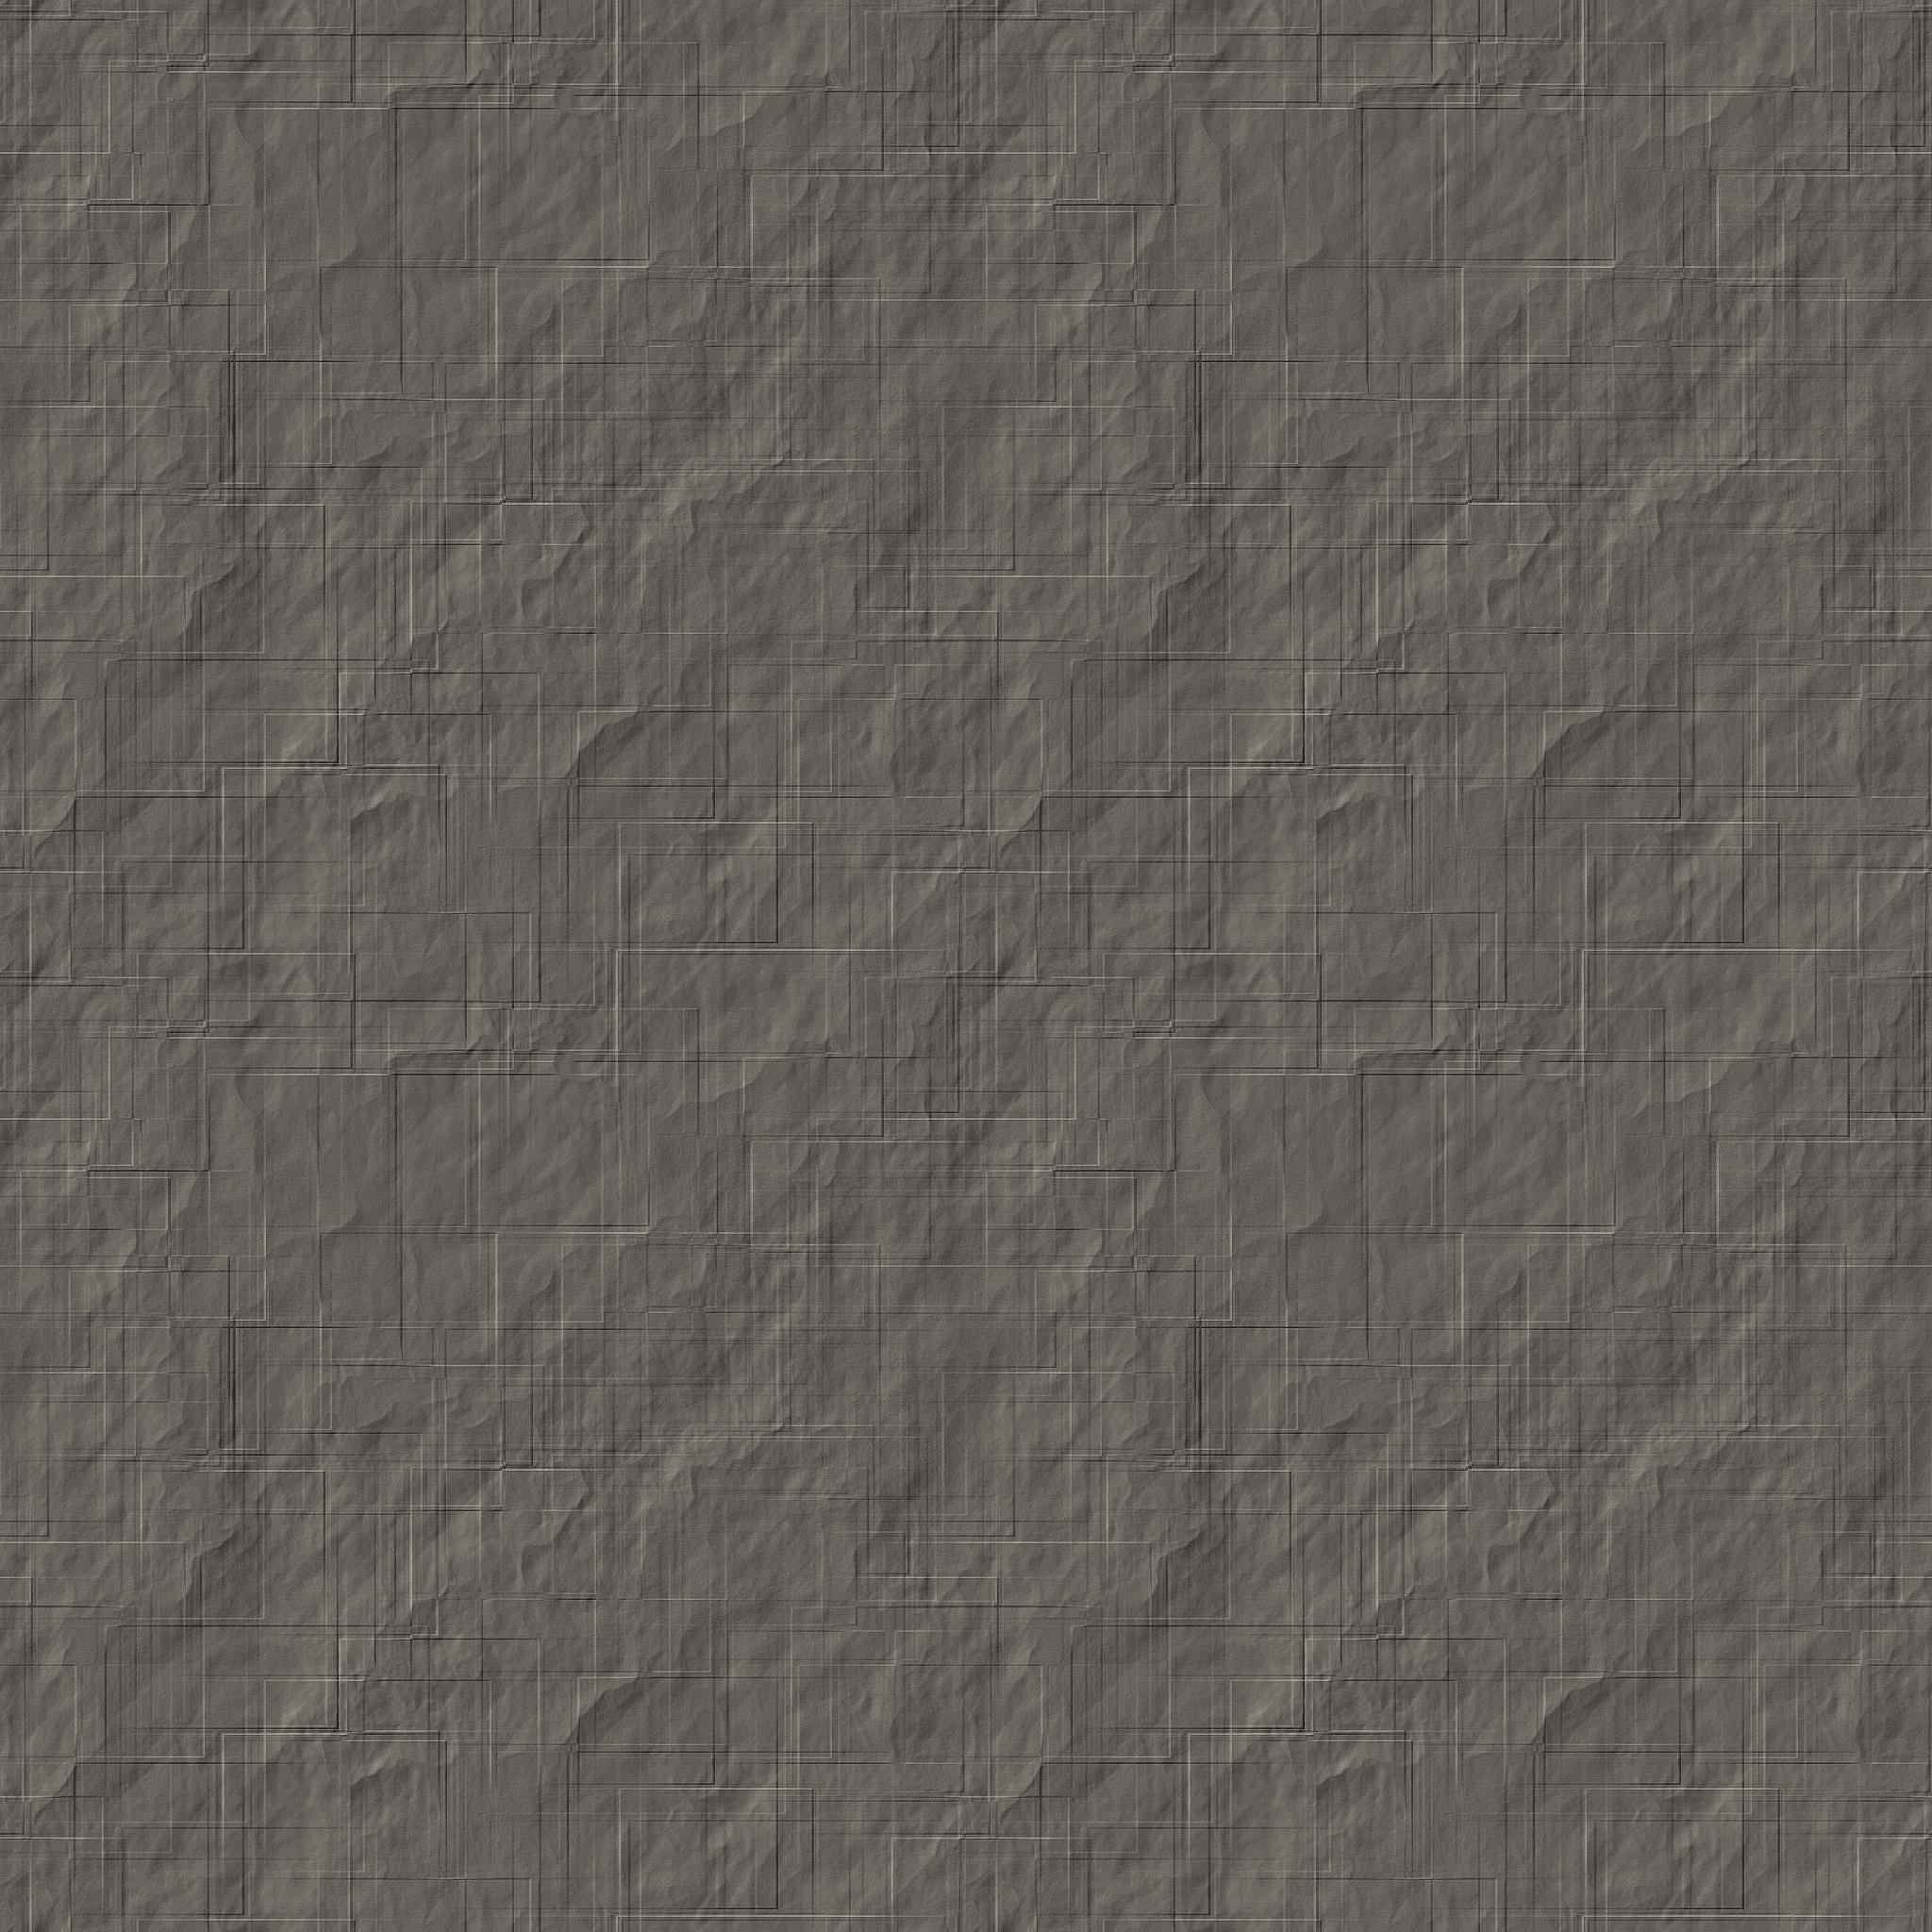 Seamless Slate Rock Texture by FantasyStock on DeviantArt